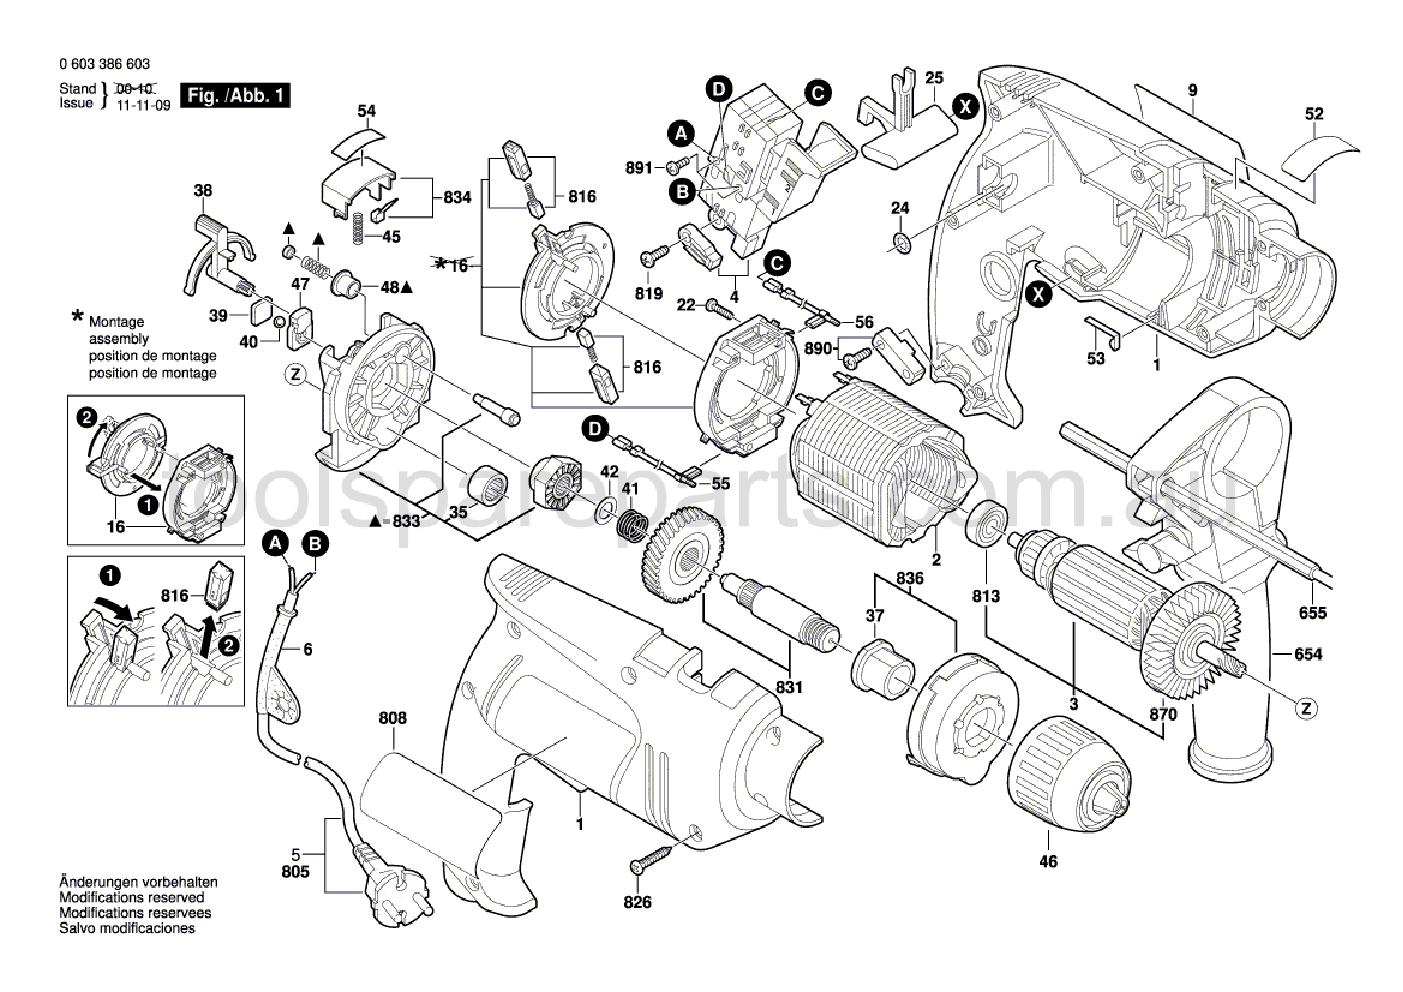 Bosch PSB 650 RE 0603386637  Diagram 1